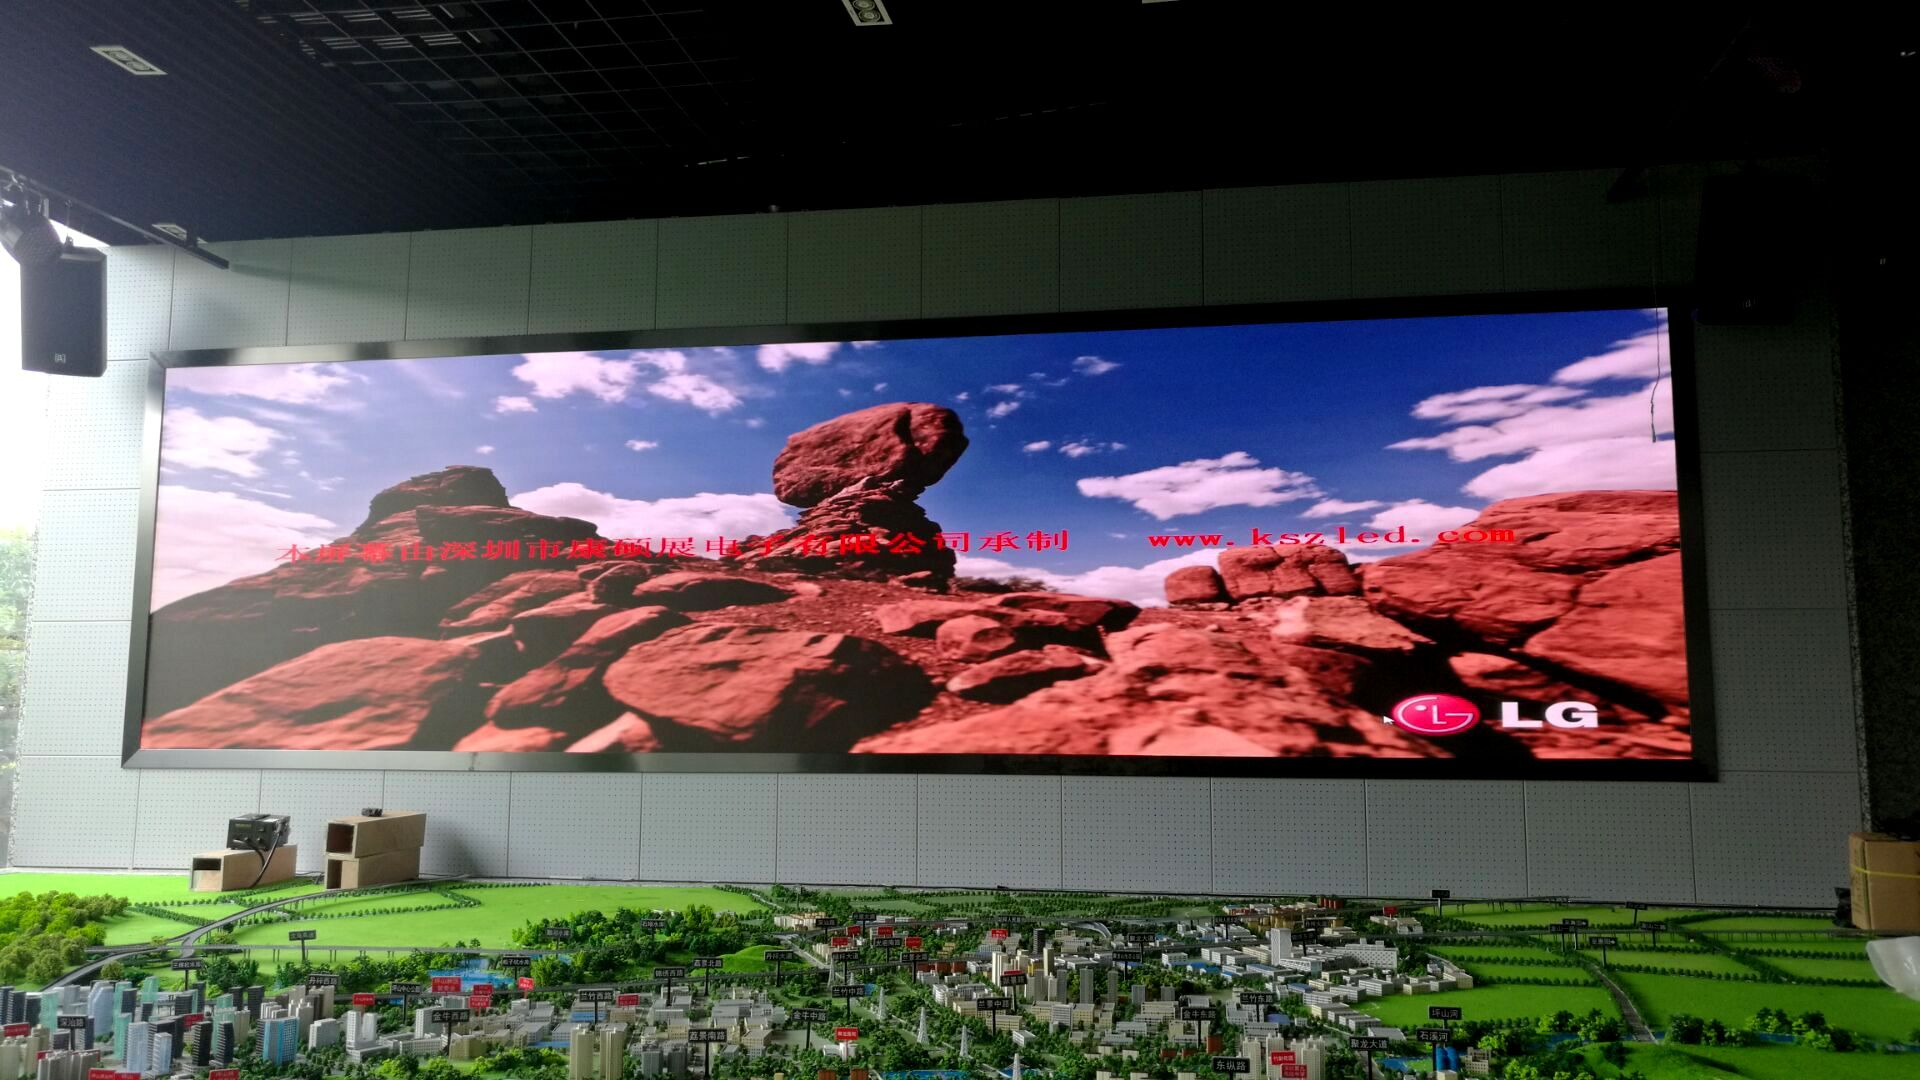 4K HD led video wall, Small Pixel P1 266 P1 5825 P1 667 P1 899